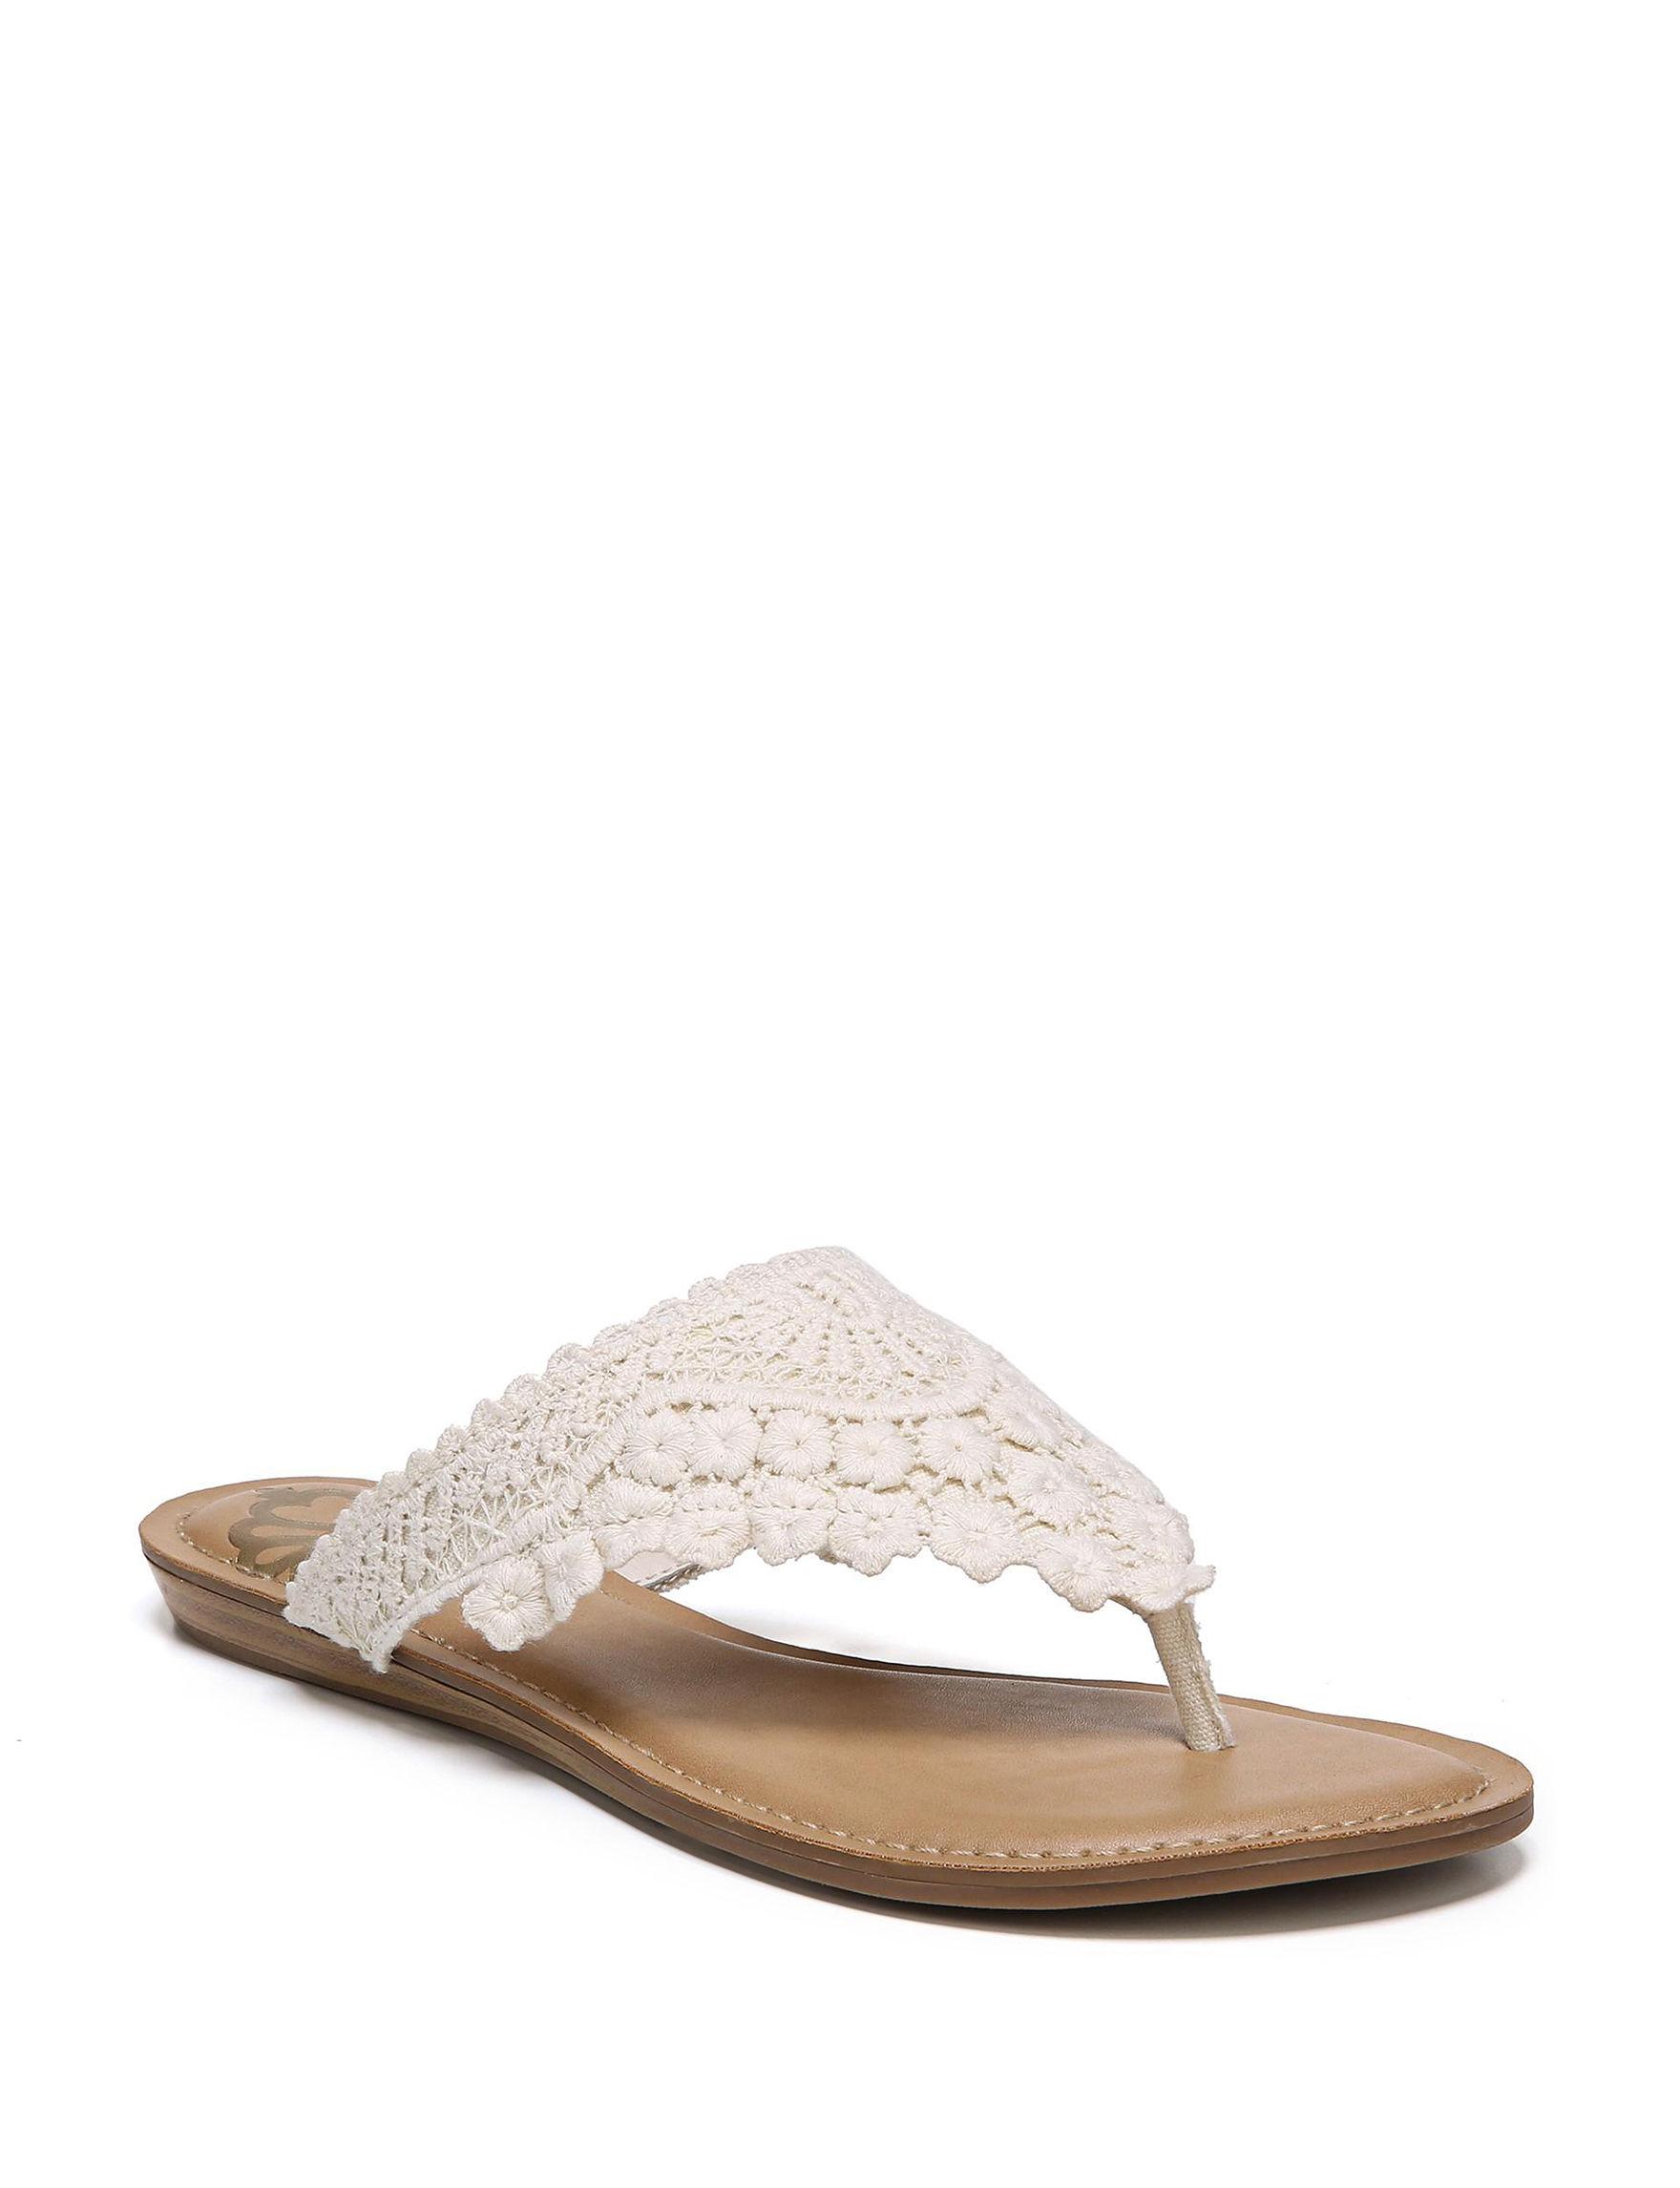 Fergalicious by Fergie Cream Flat Sandals Flip Flops